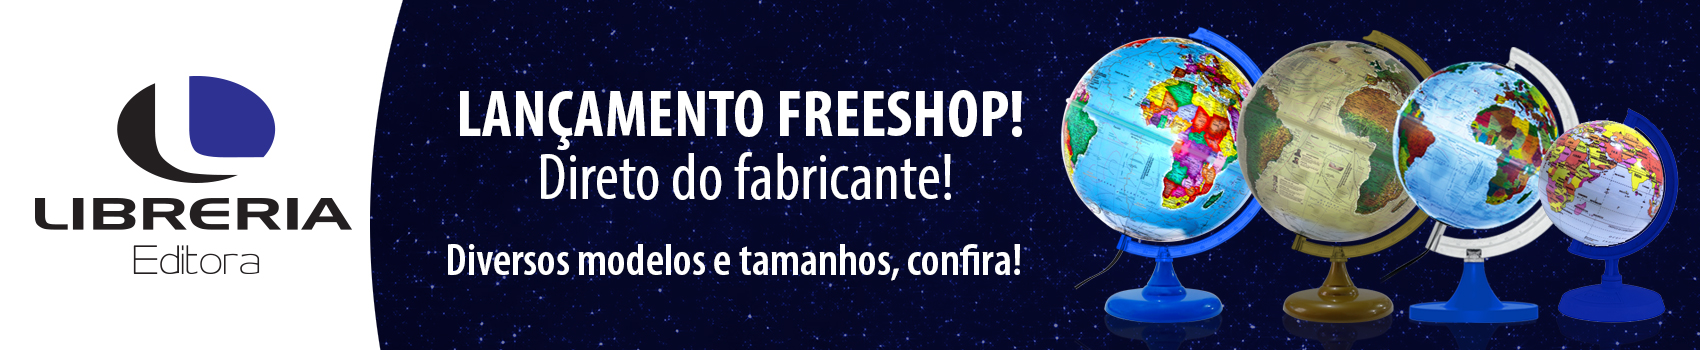 Libreria Editora